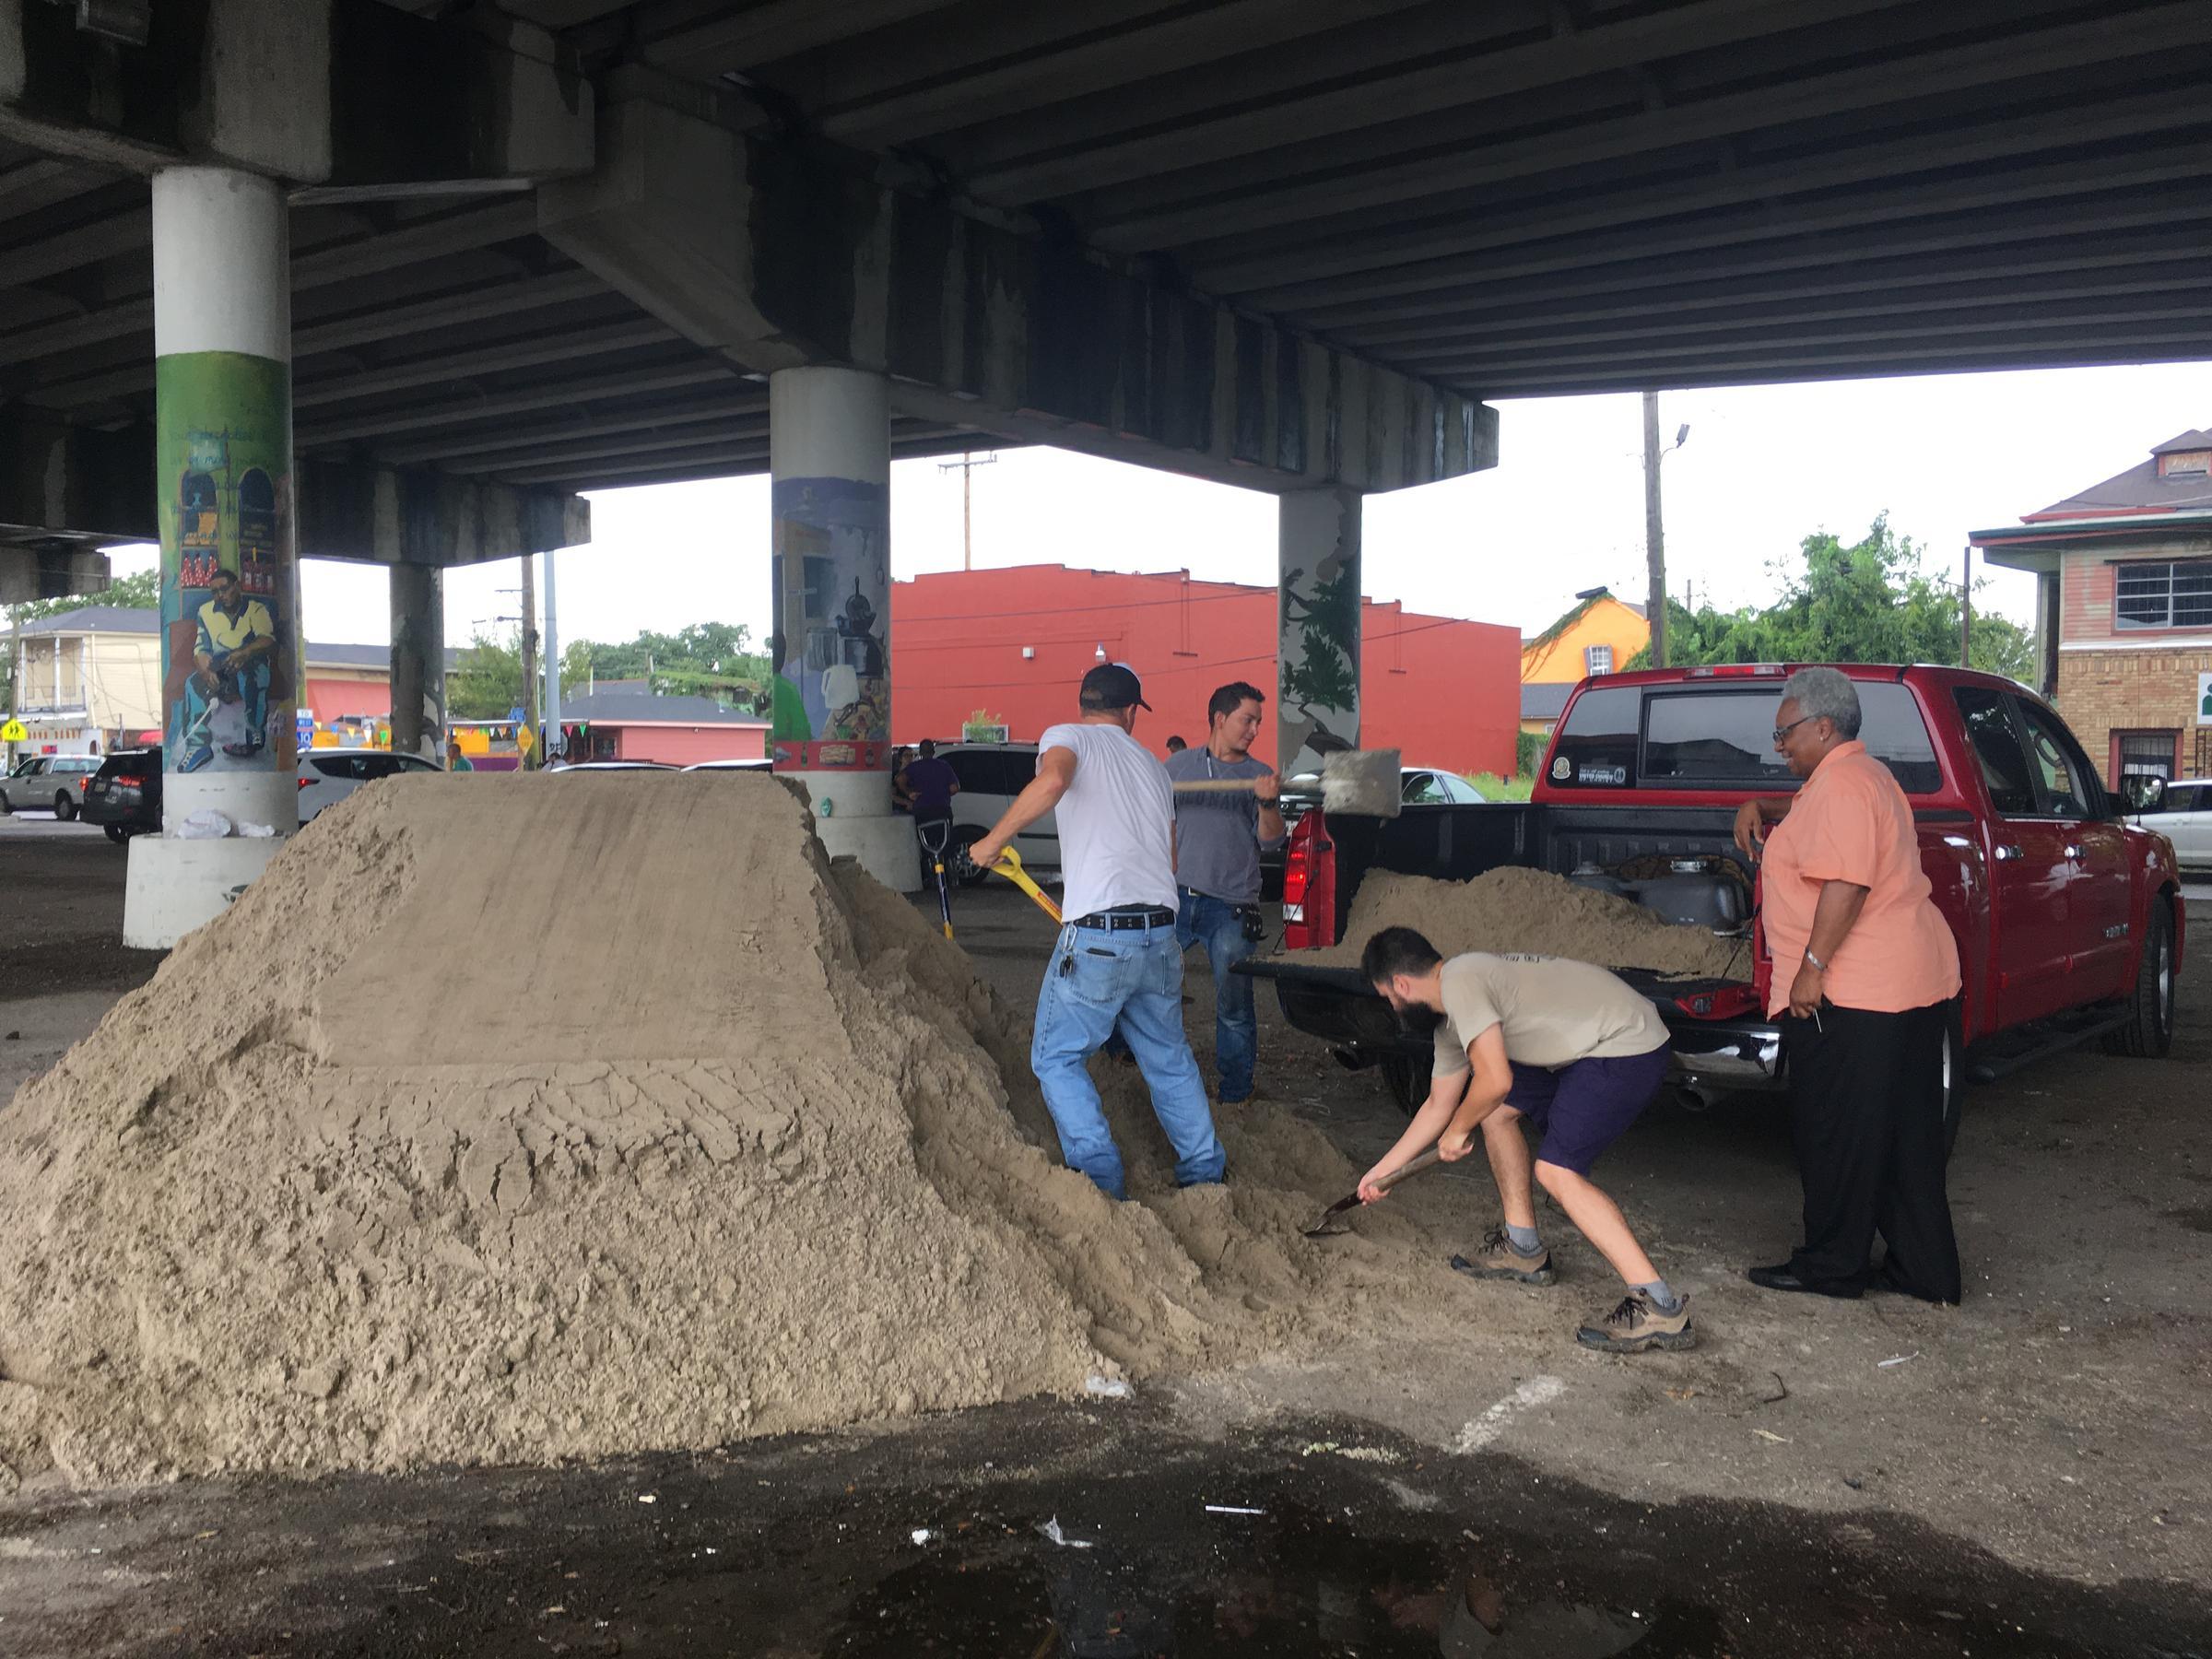 Emergency Decreed following Floods in New Orleans